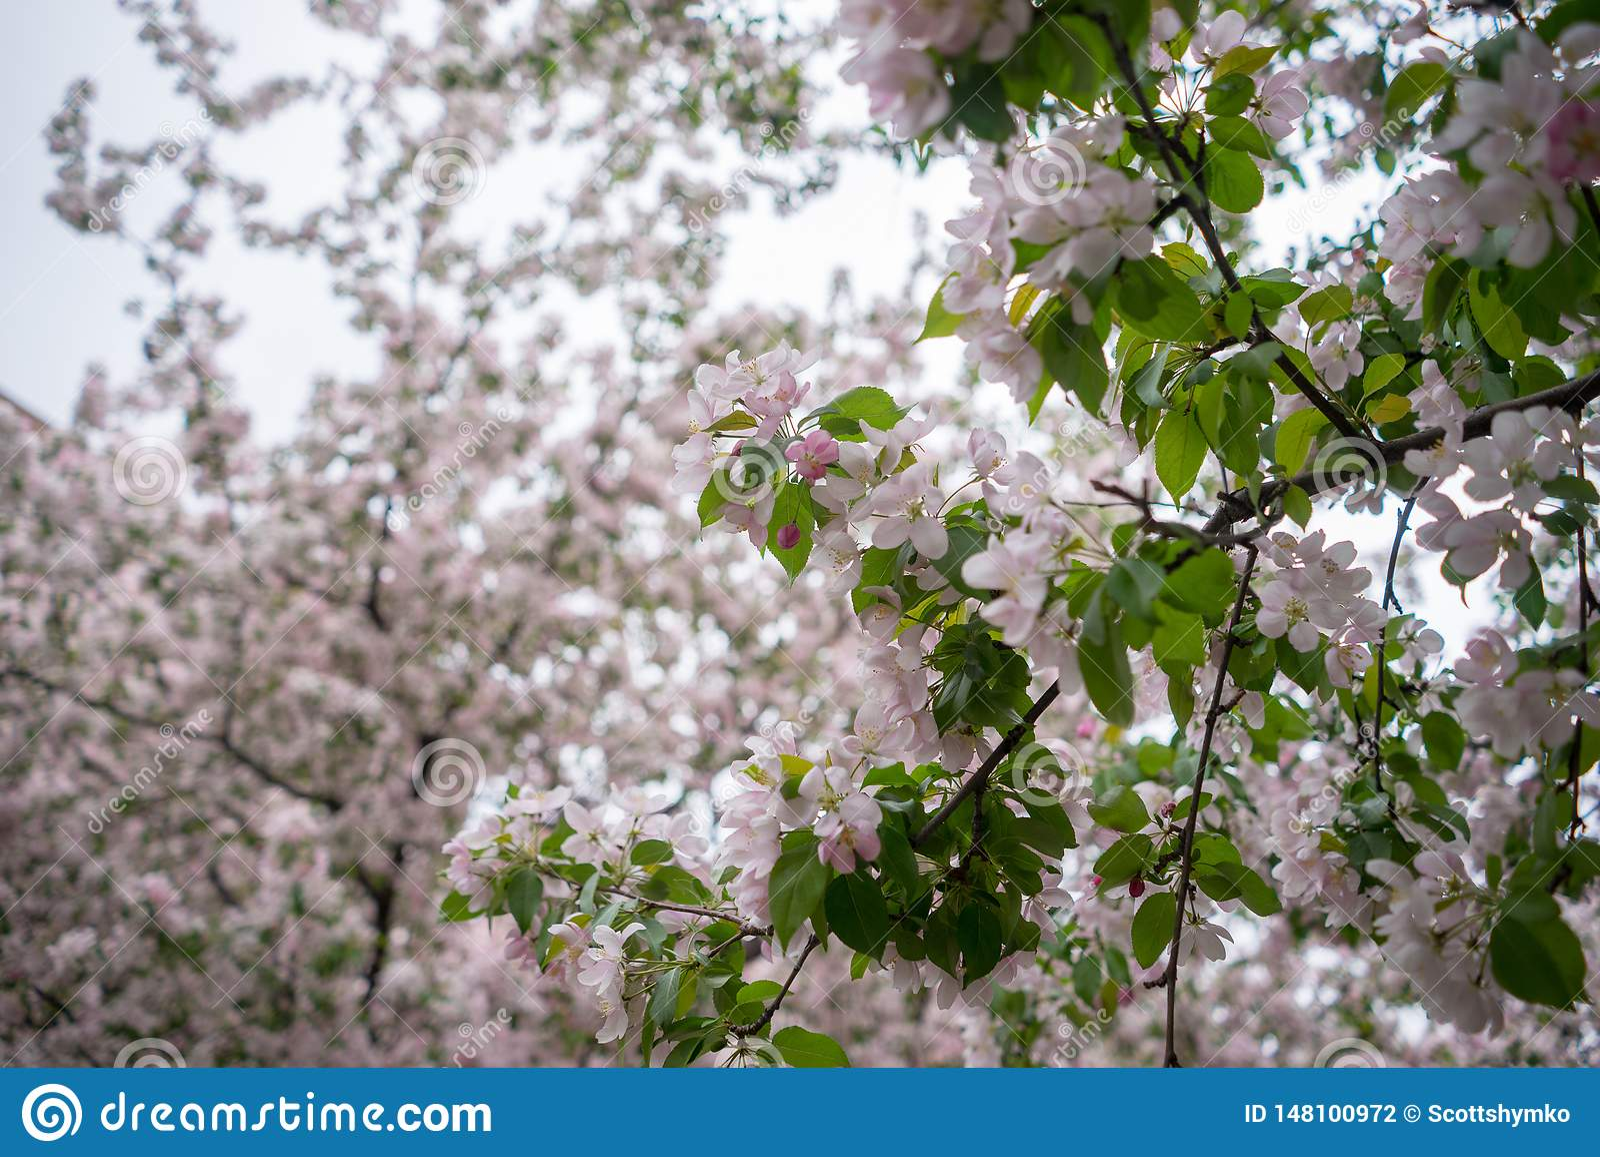 Árvores de cereja na flor completa em Montreal